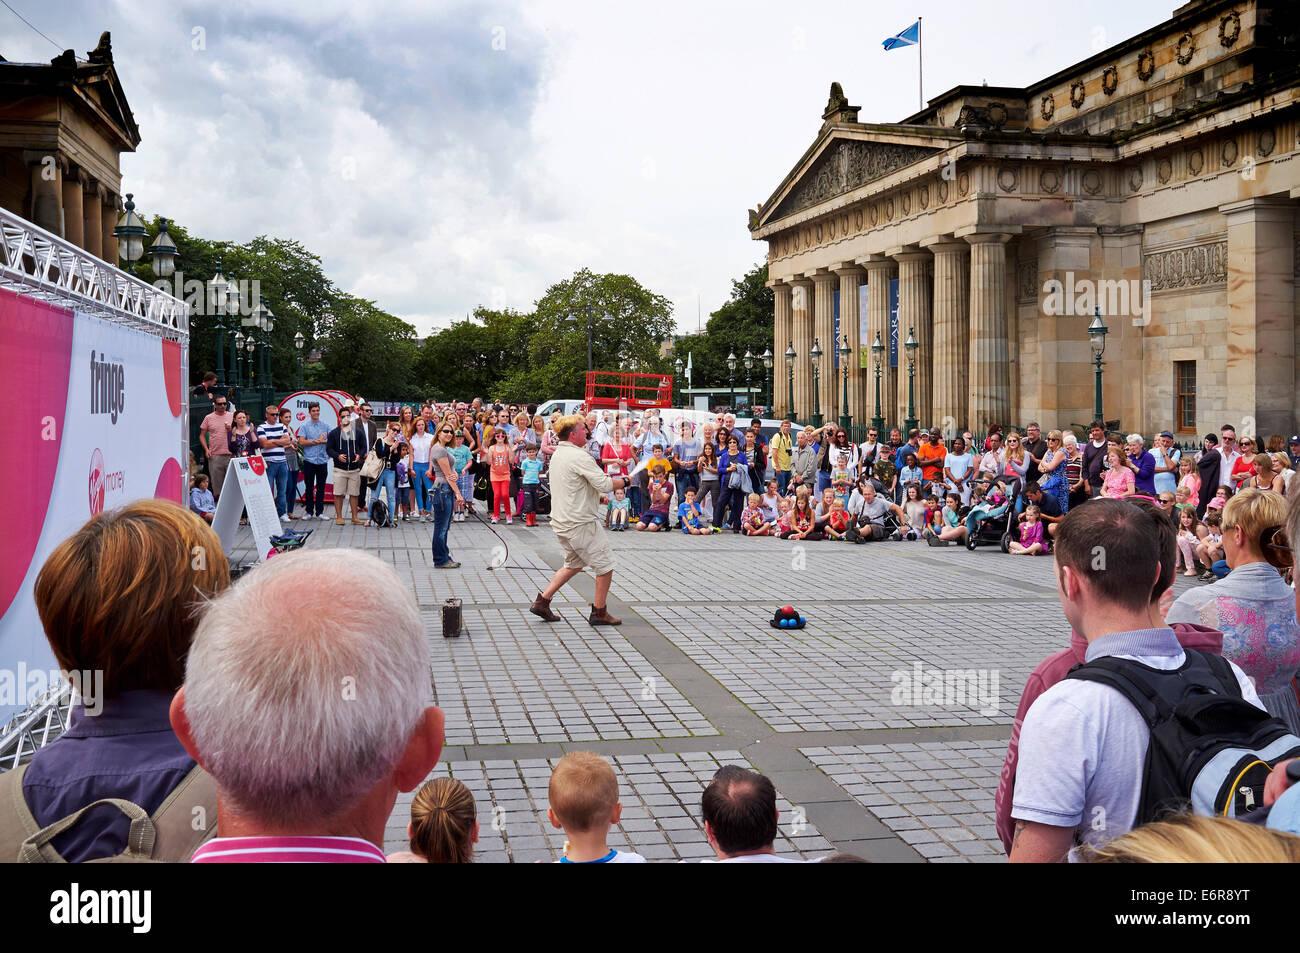 Edinburgh Festival 2014, Edinburgh, Scotland,  crowd watching street performer - Stock Image